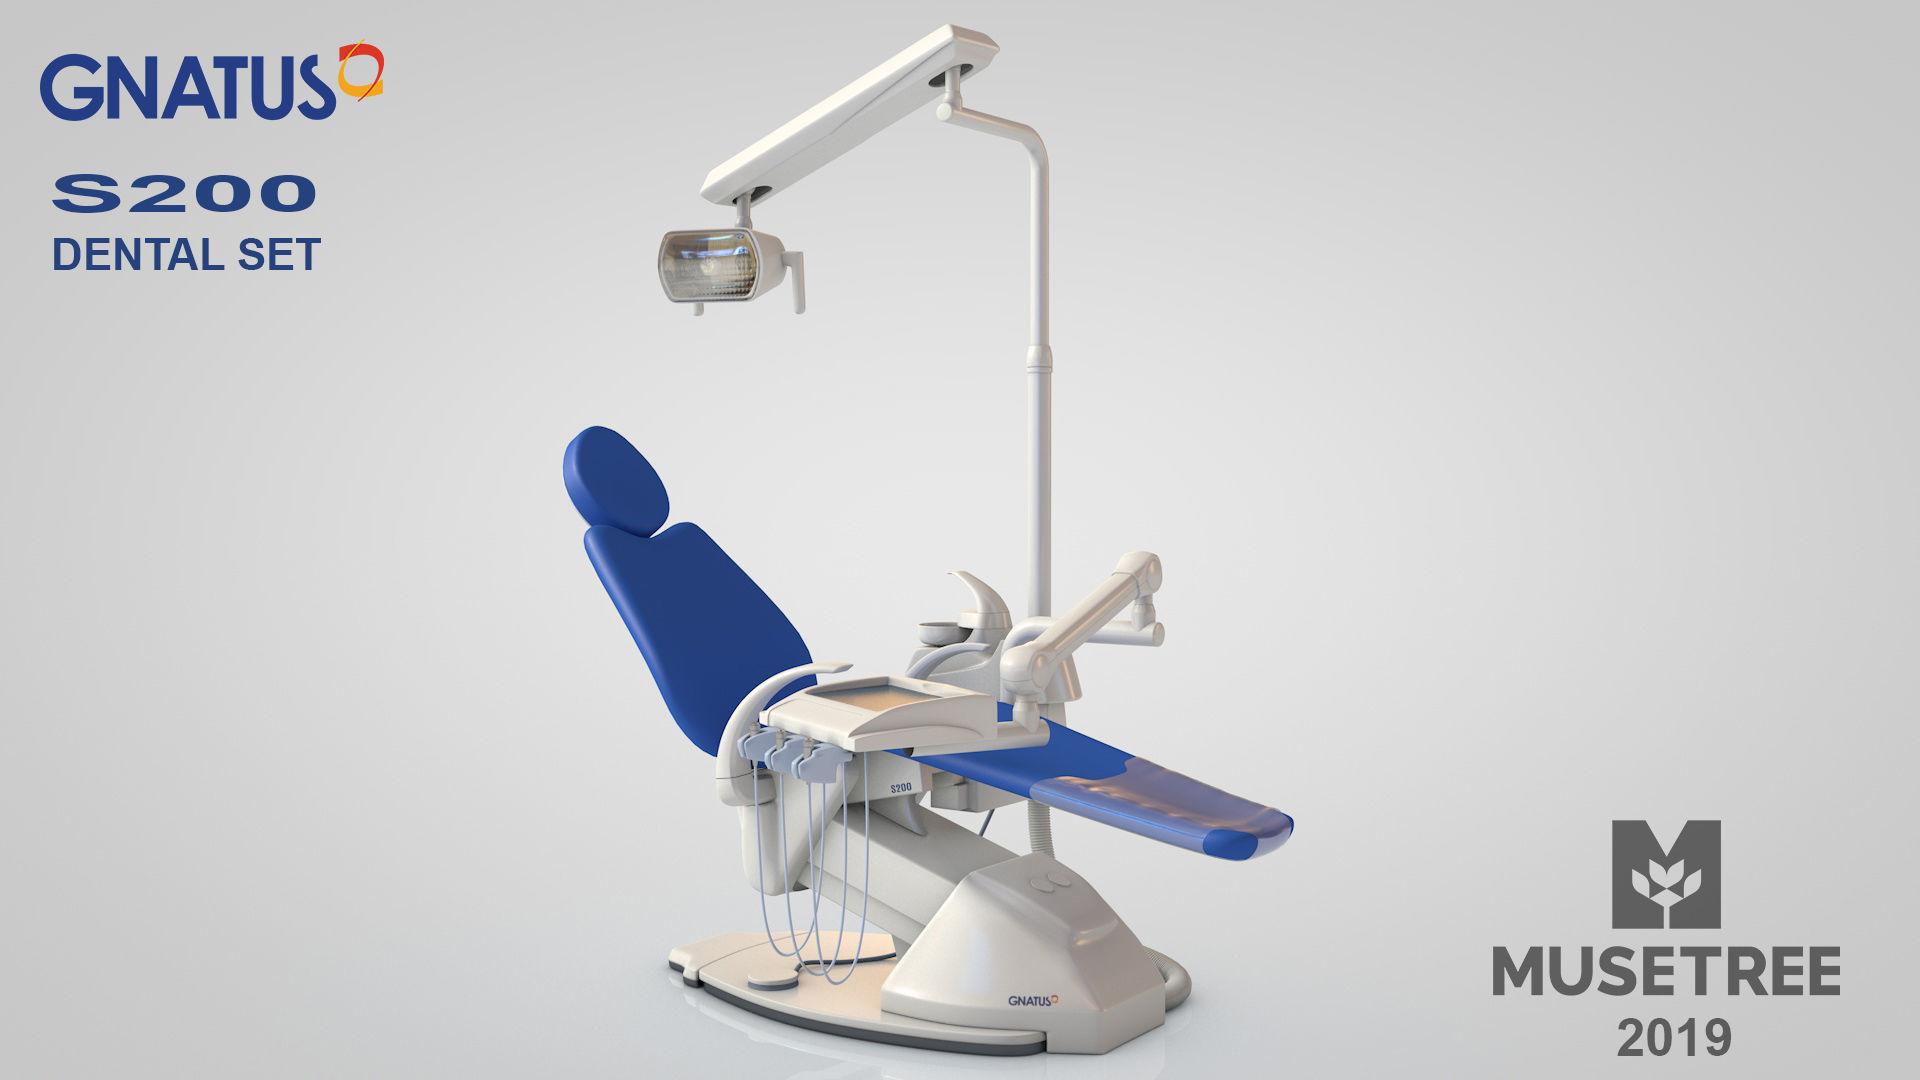 Dental set Gnatus S200